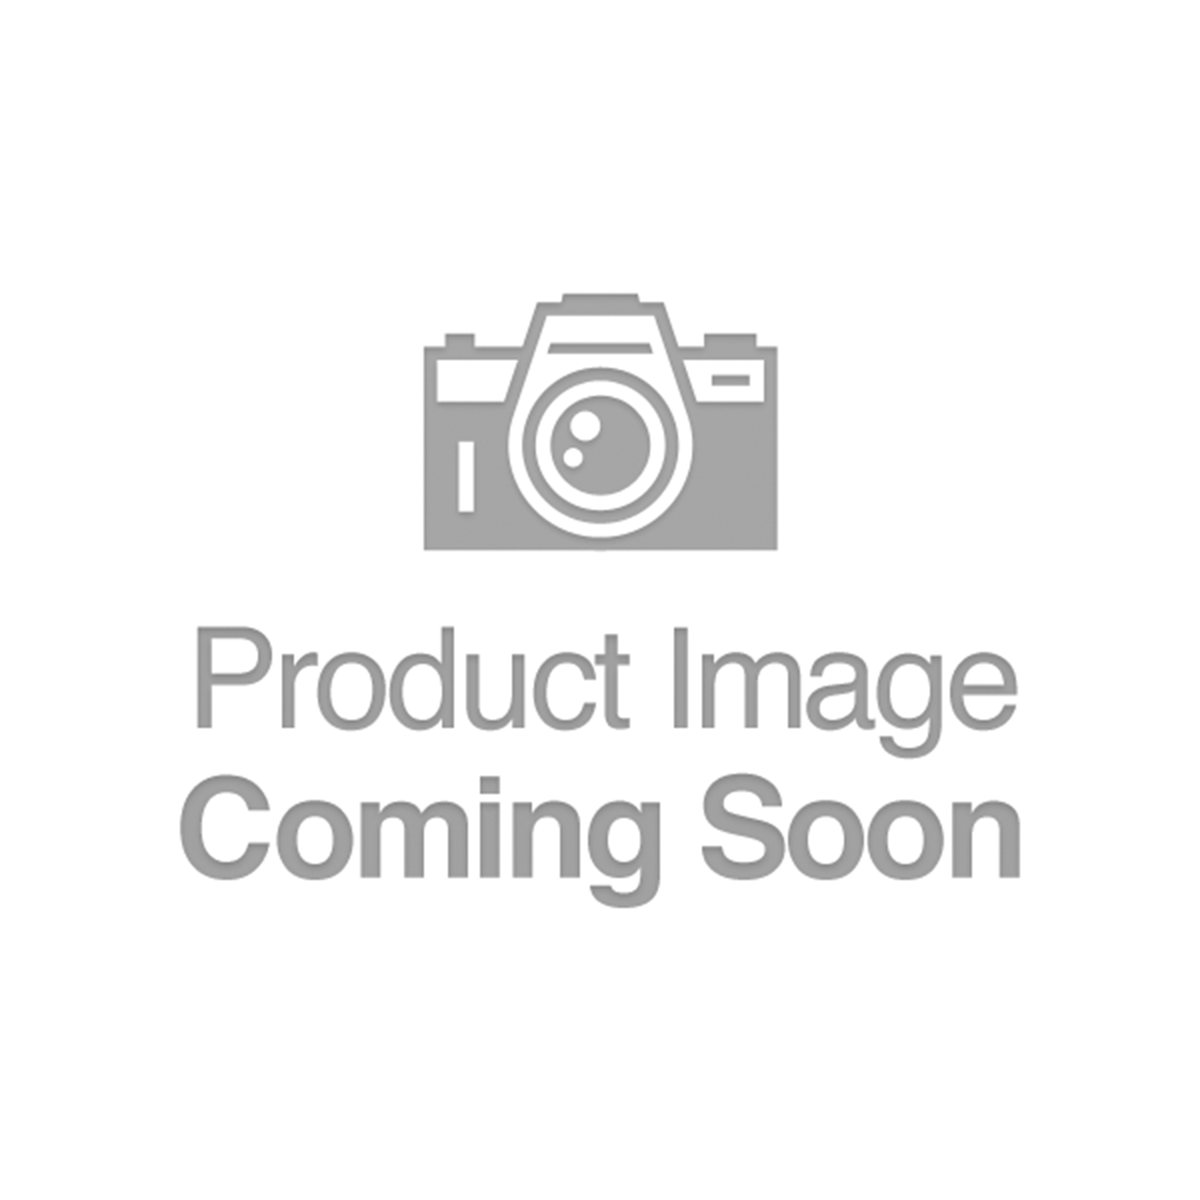 Alexandria – Pennsylvania – CH 11263 – FR 1802-2 – PMG 64 EPQ